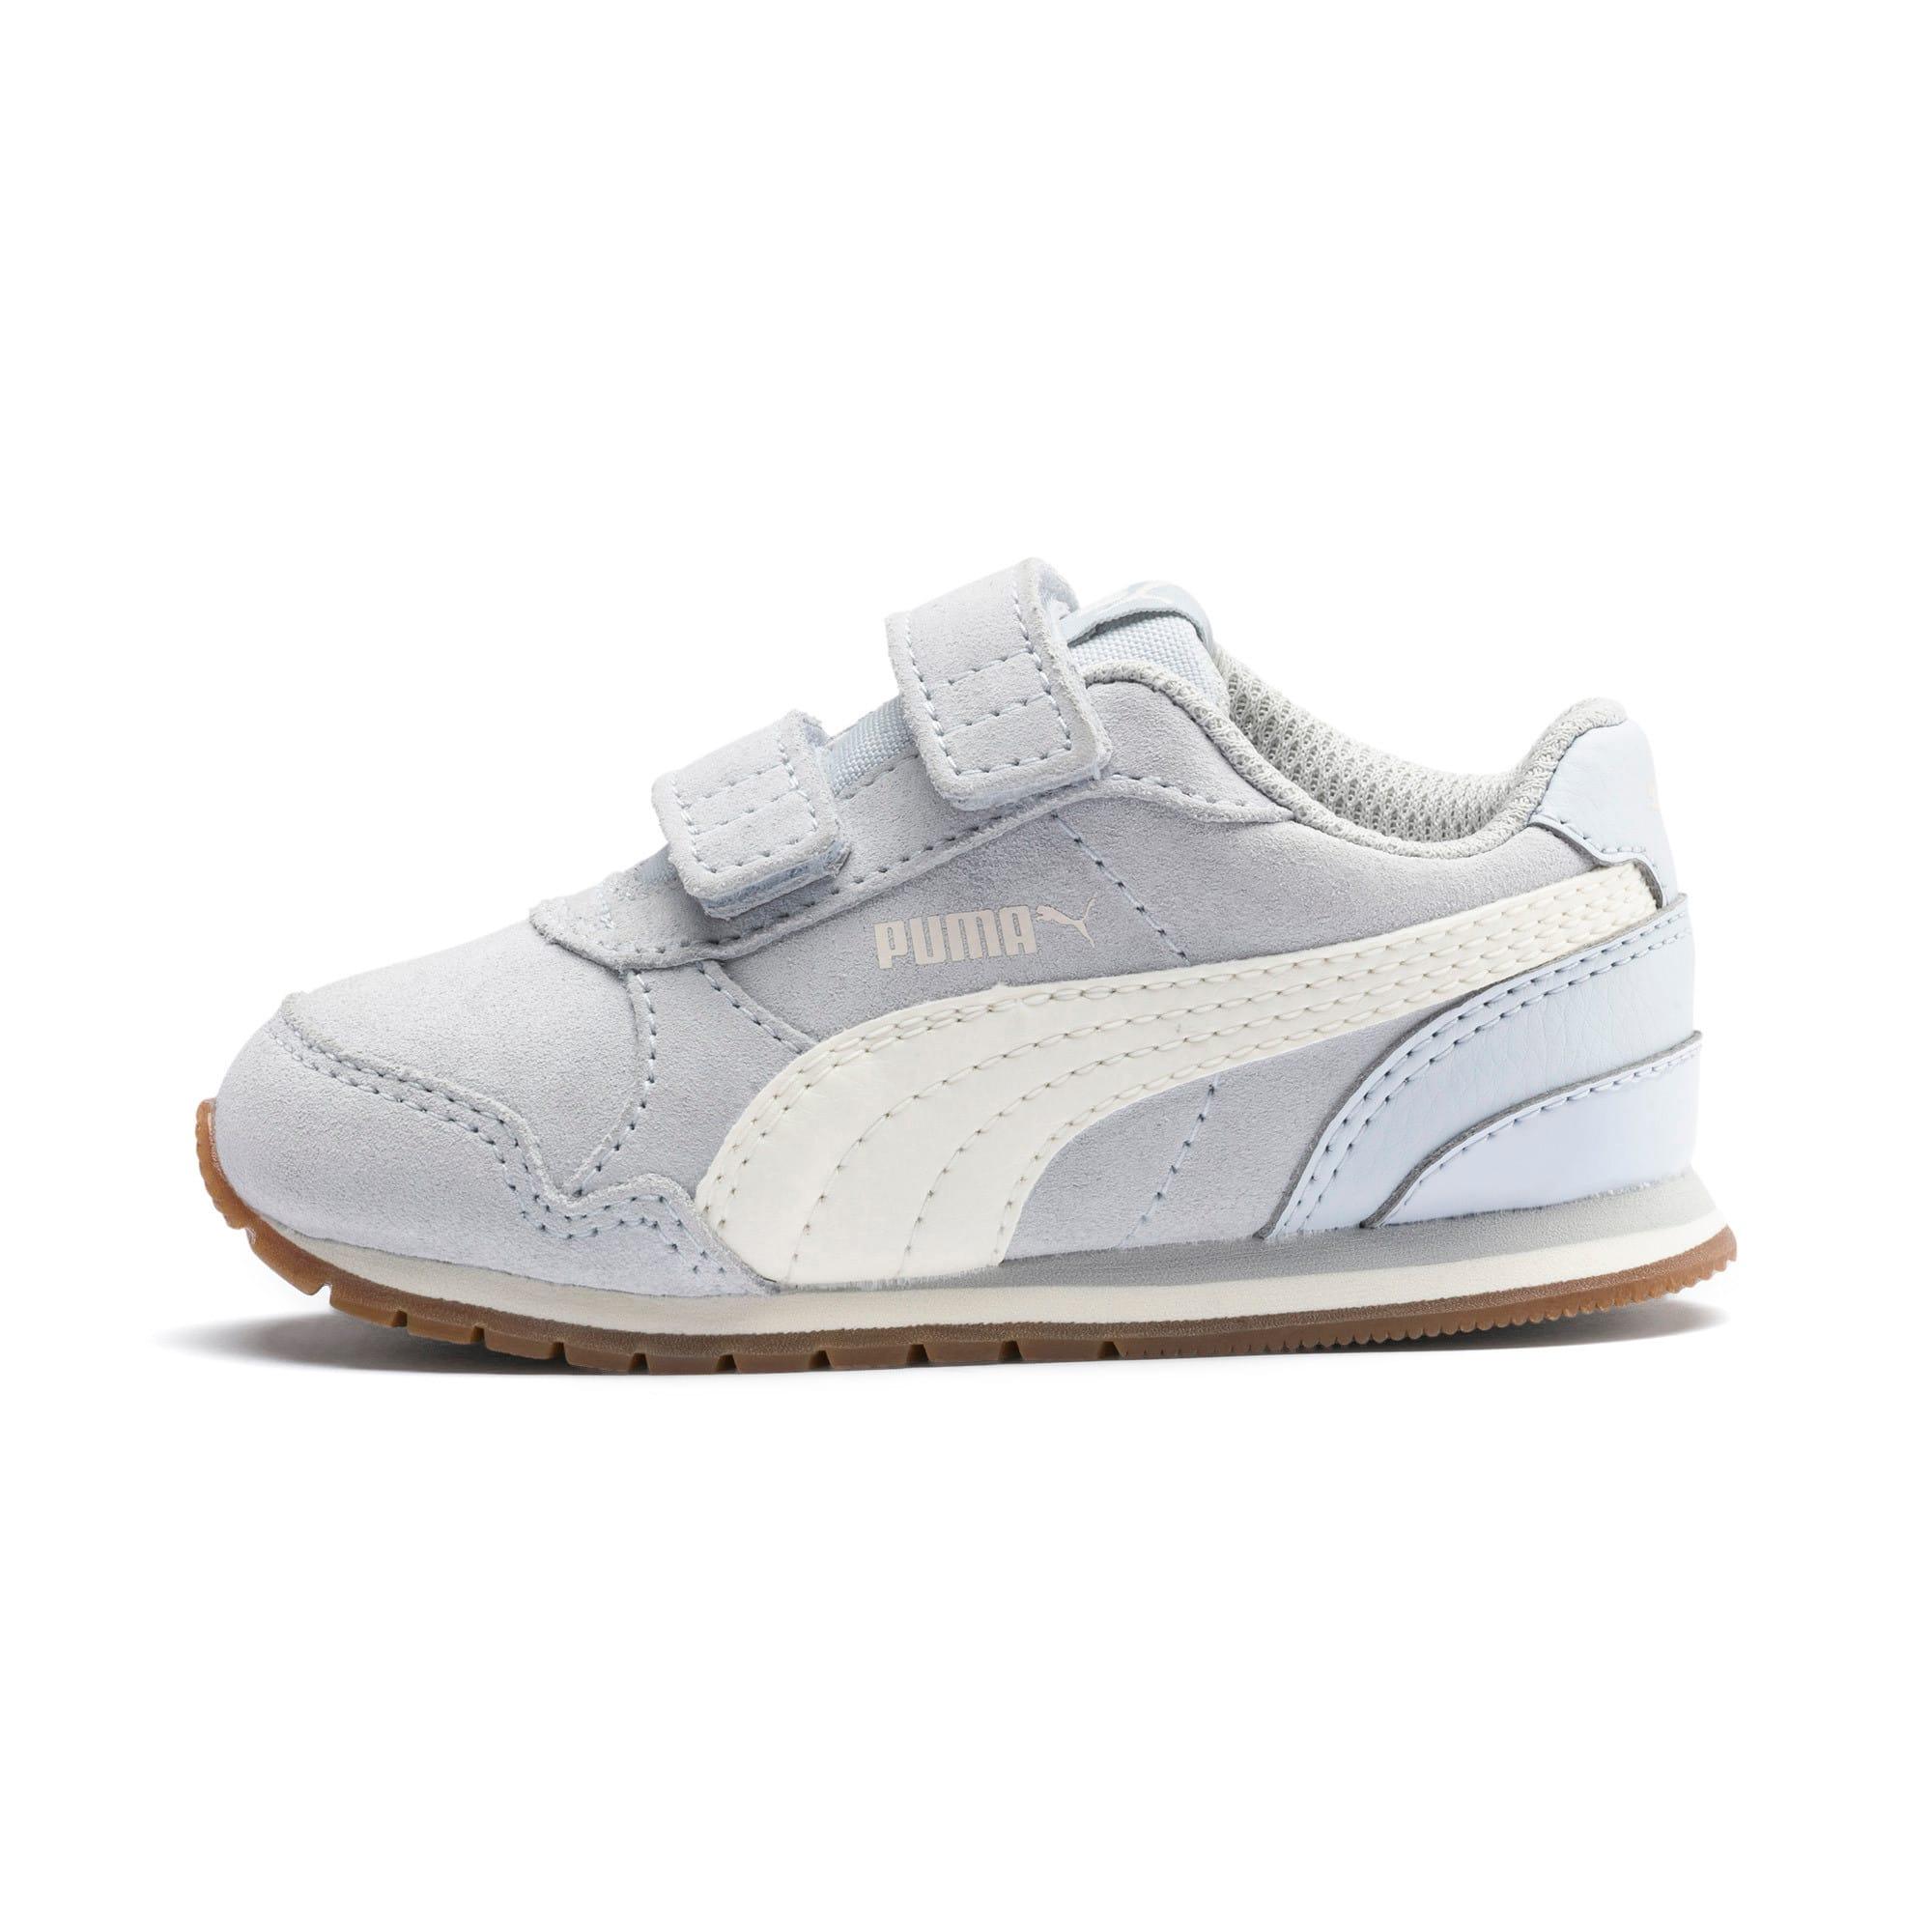 Miniatura 1 de Zapatos ST Runner v2 Suede para bebé, Heather-Whisper White, mediano